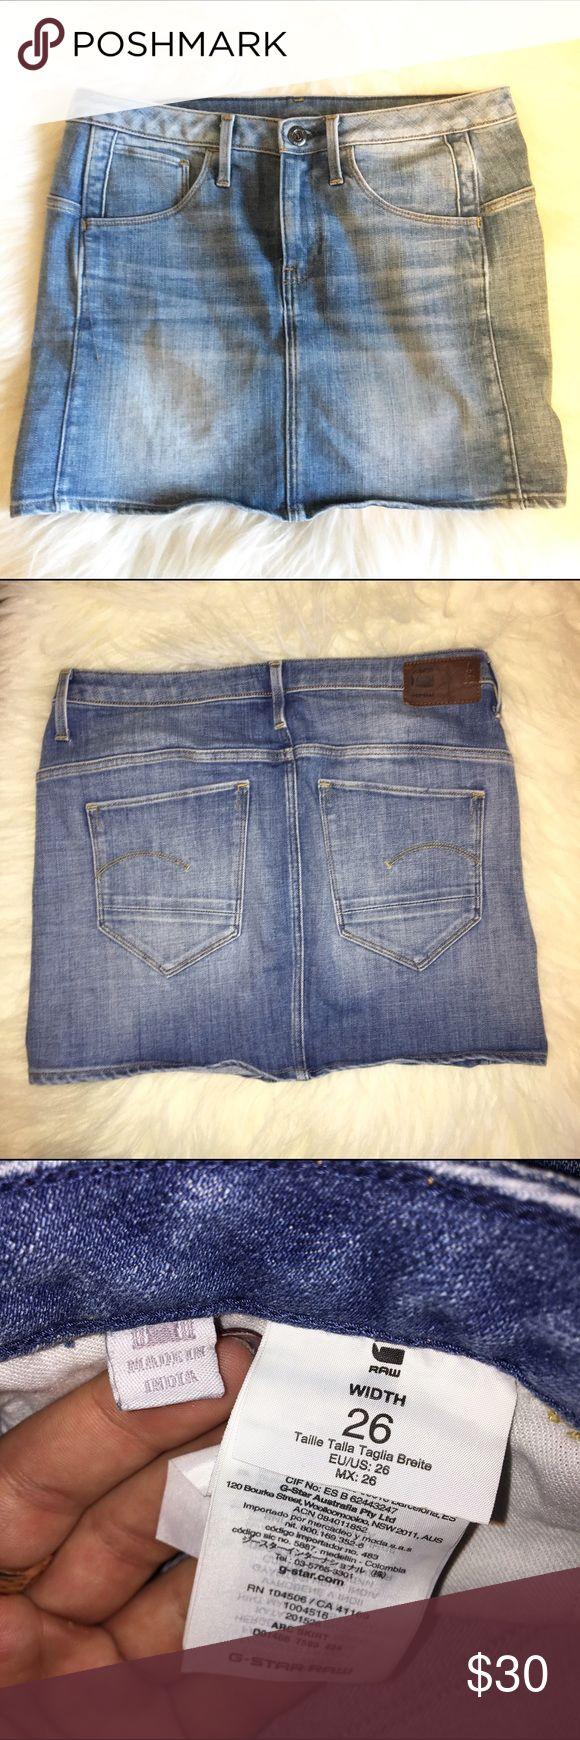 G Star Raw Jean Skirt Good condition G Star Raw Jean skirt G-Star Raw Skirts Mini